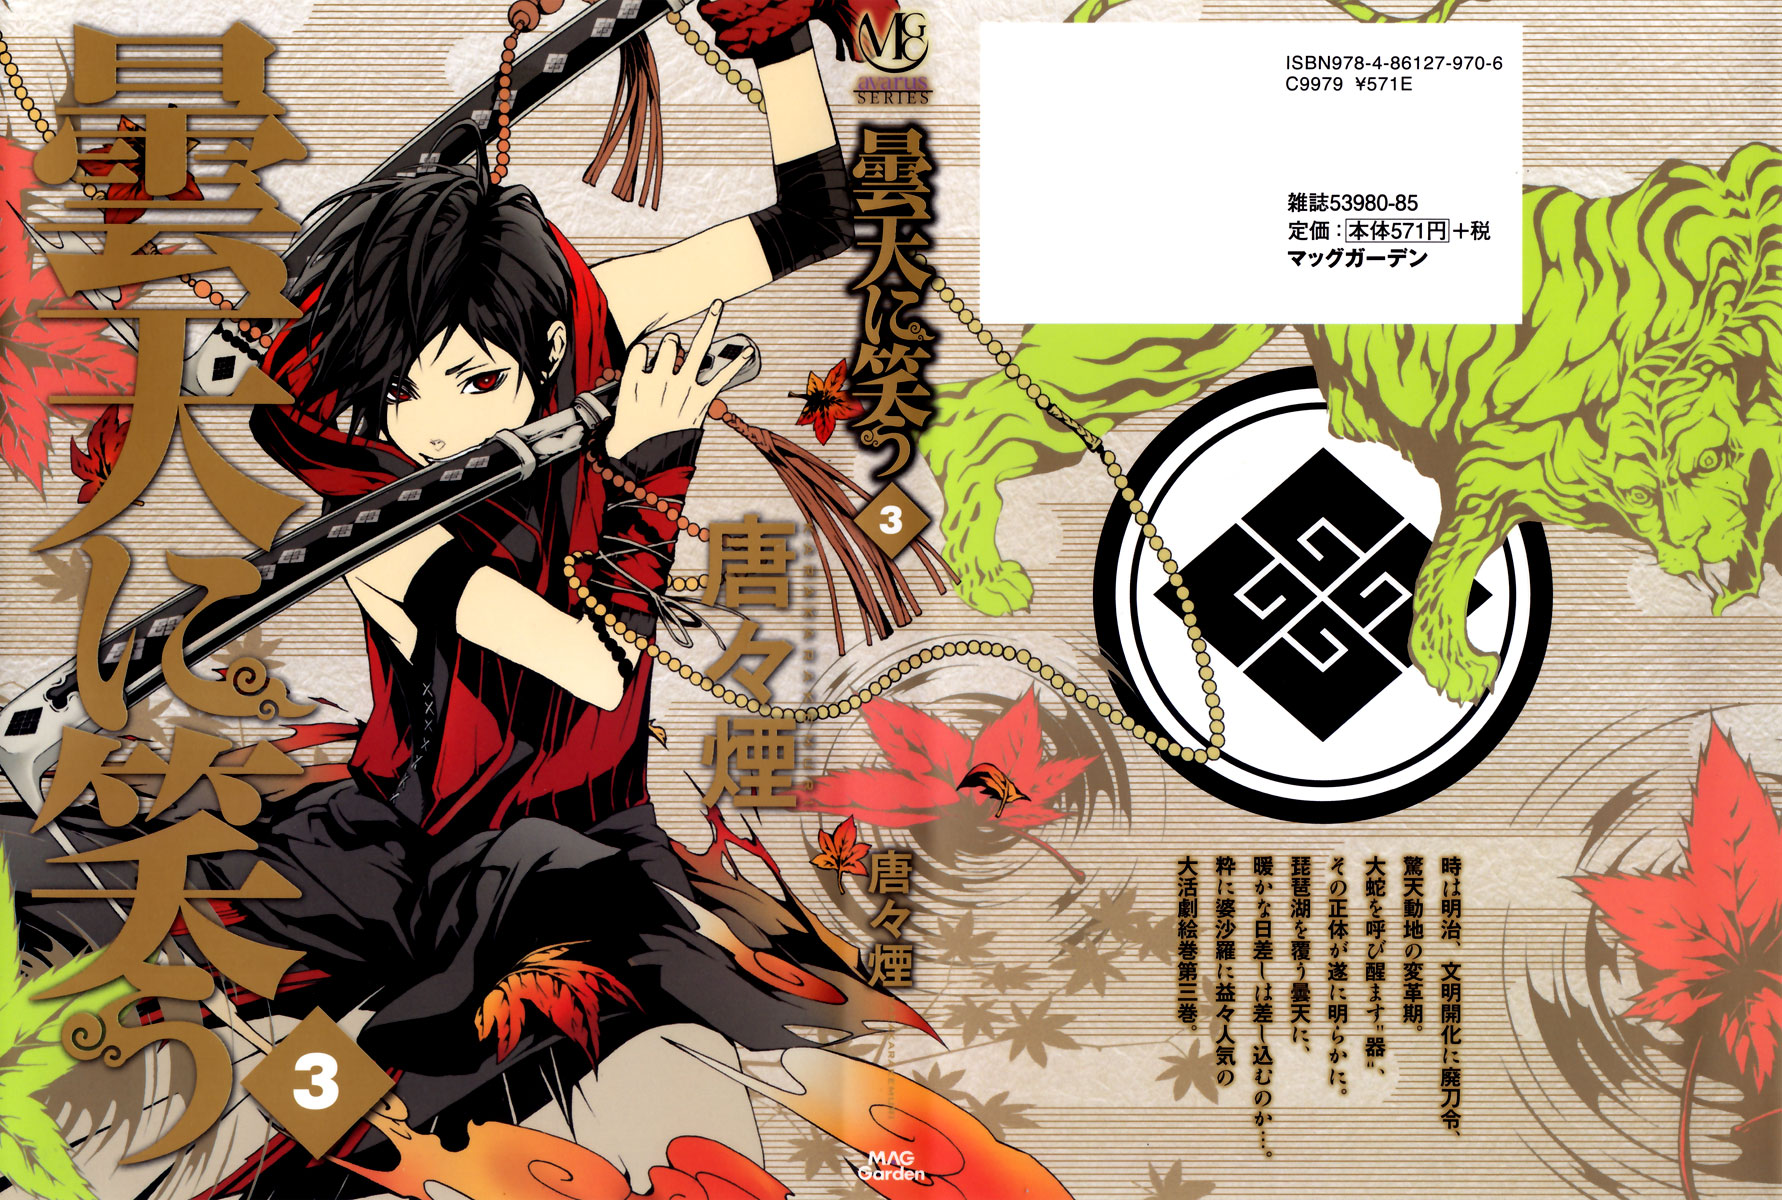 Tags: Scan, Manga Cover, Official Art, Donten ni Warau, Kumo Soramaru, Karakara Kemuri